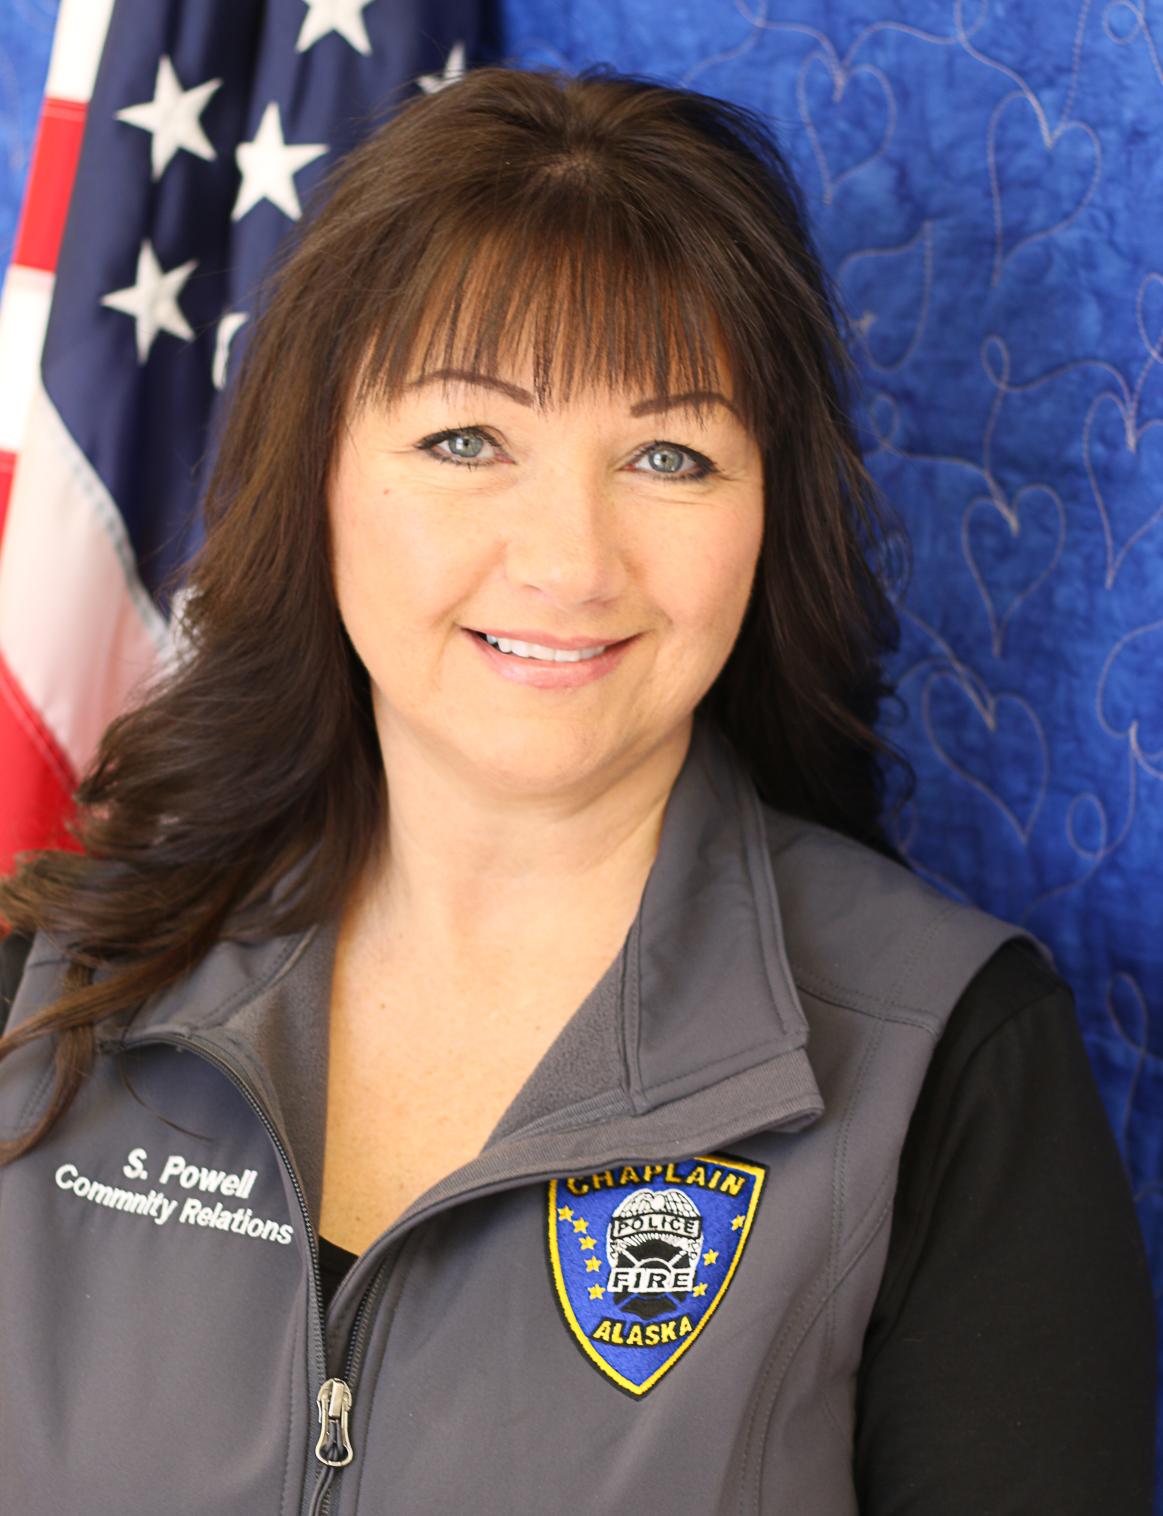 Shiloh Powell - Advisory Council